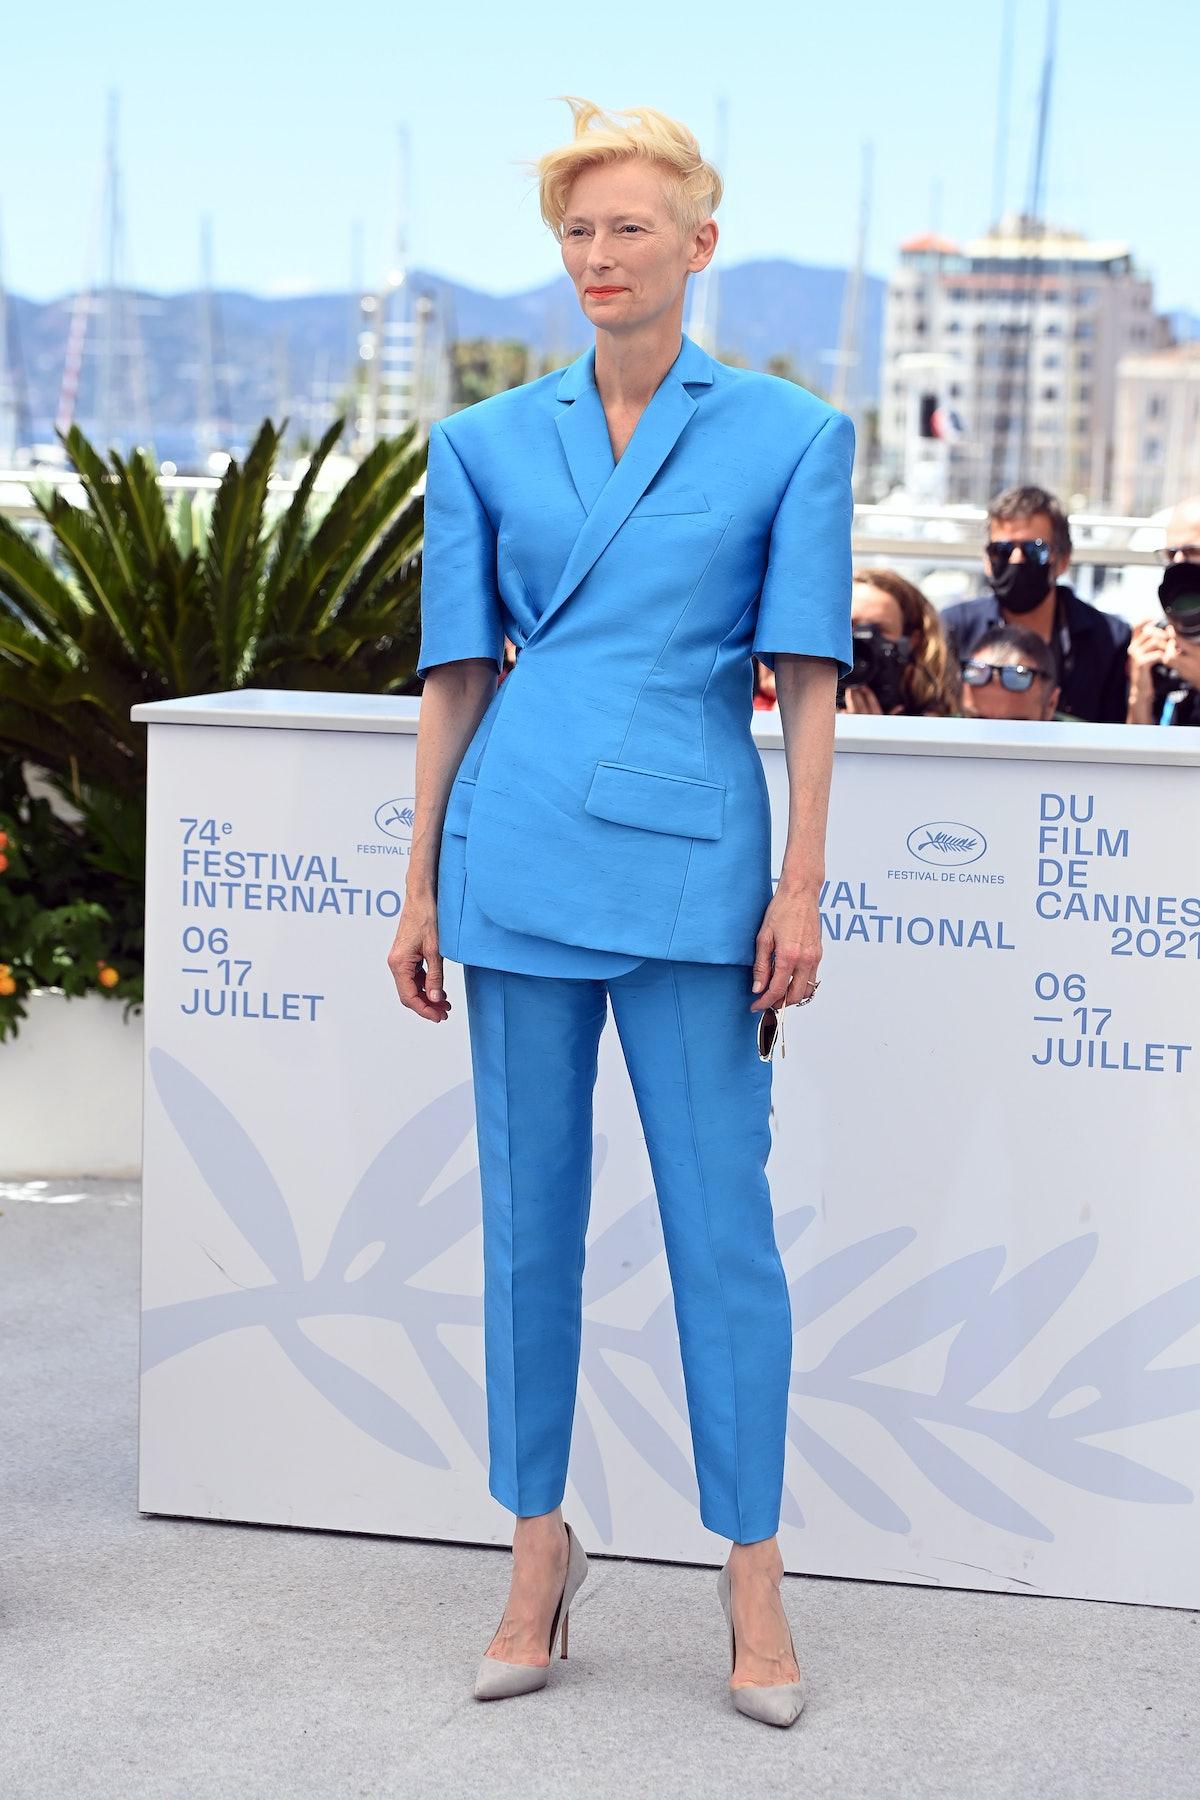 Tilda wearing a blue suit